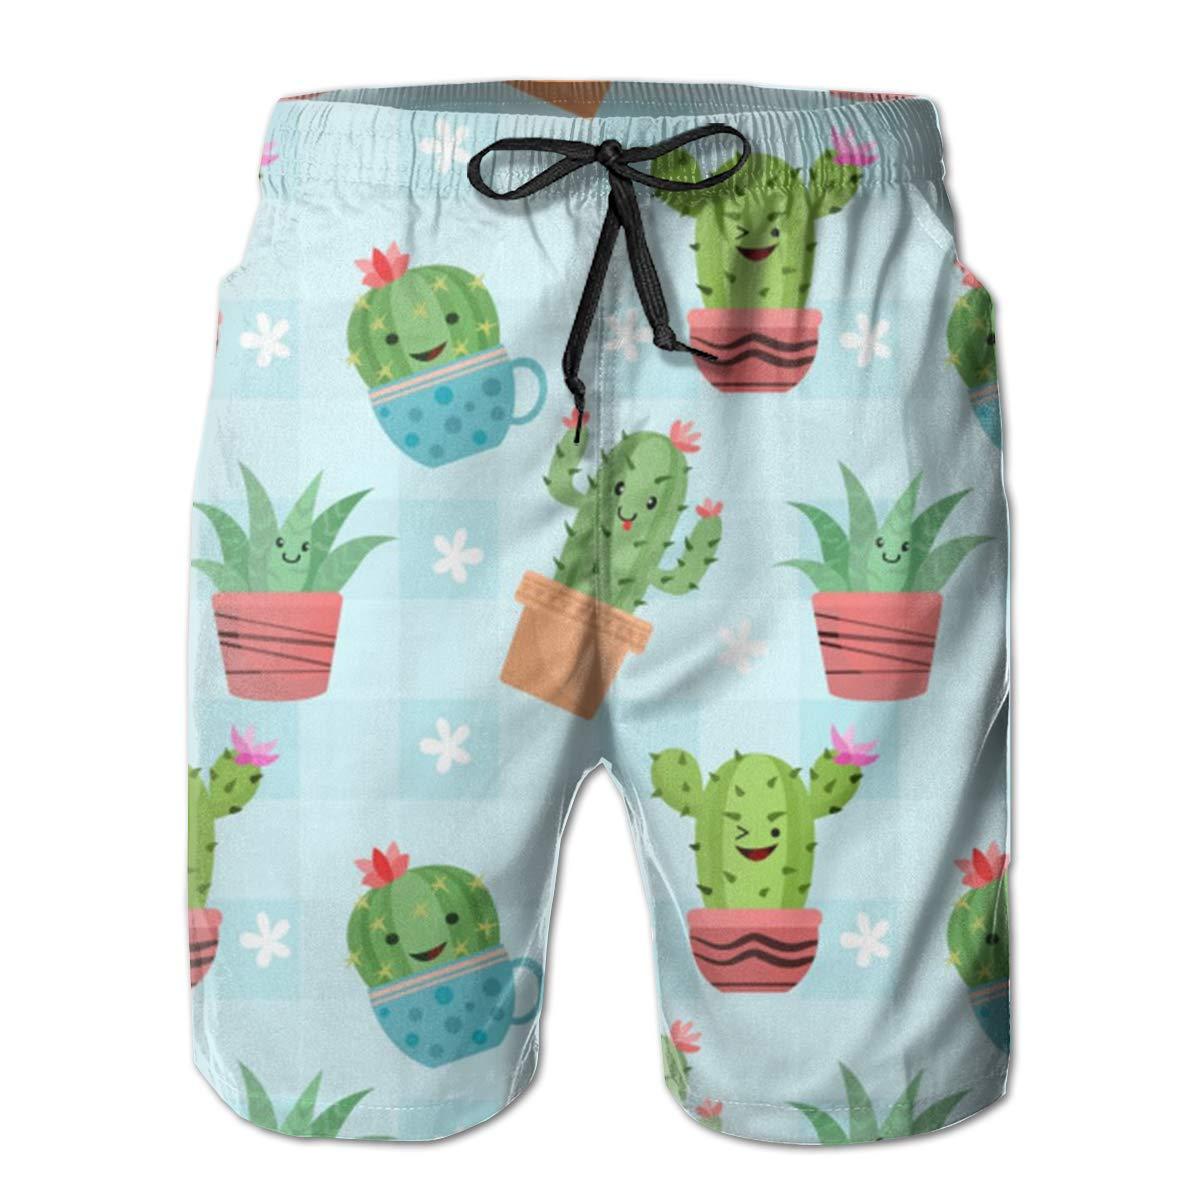 WMDJEG Cute-Cactus-pots Mens Summer Beachwear Sports Running Swim Board Shorts Mesh Lining